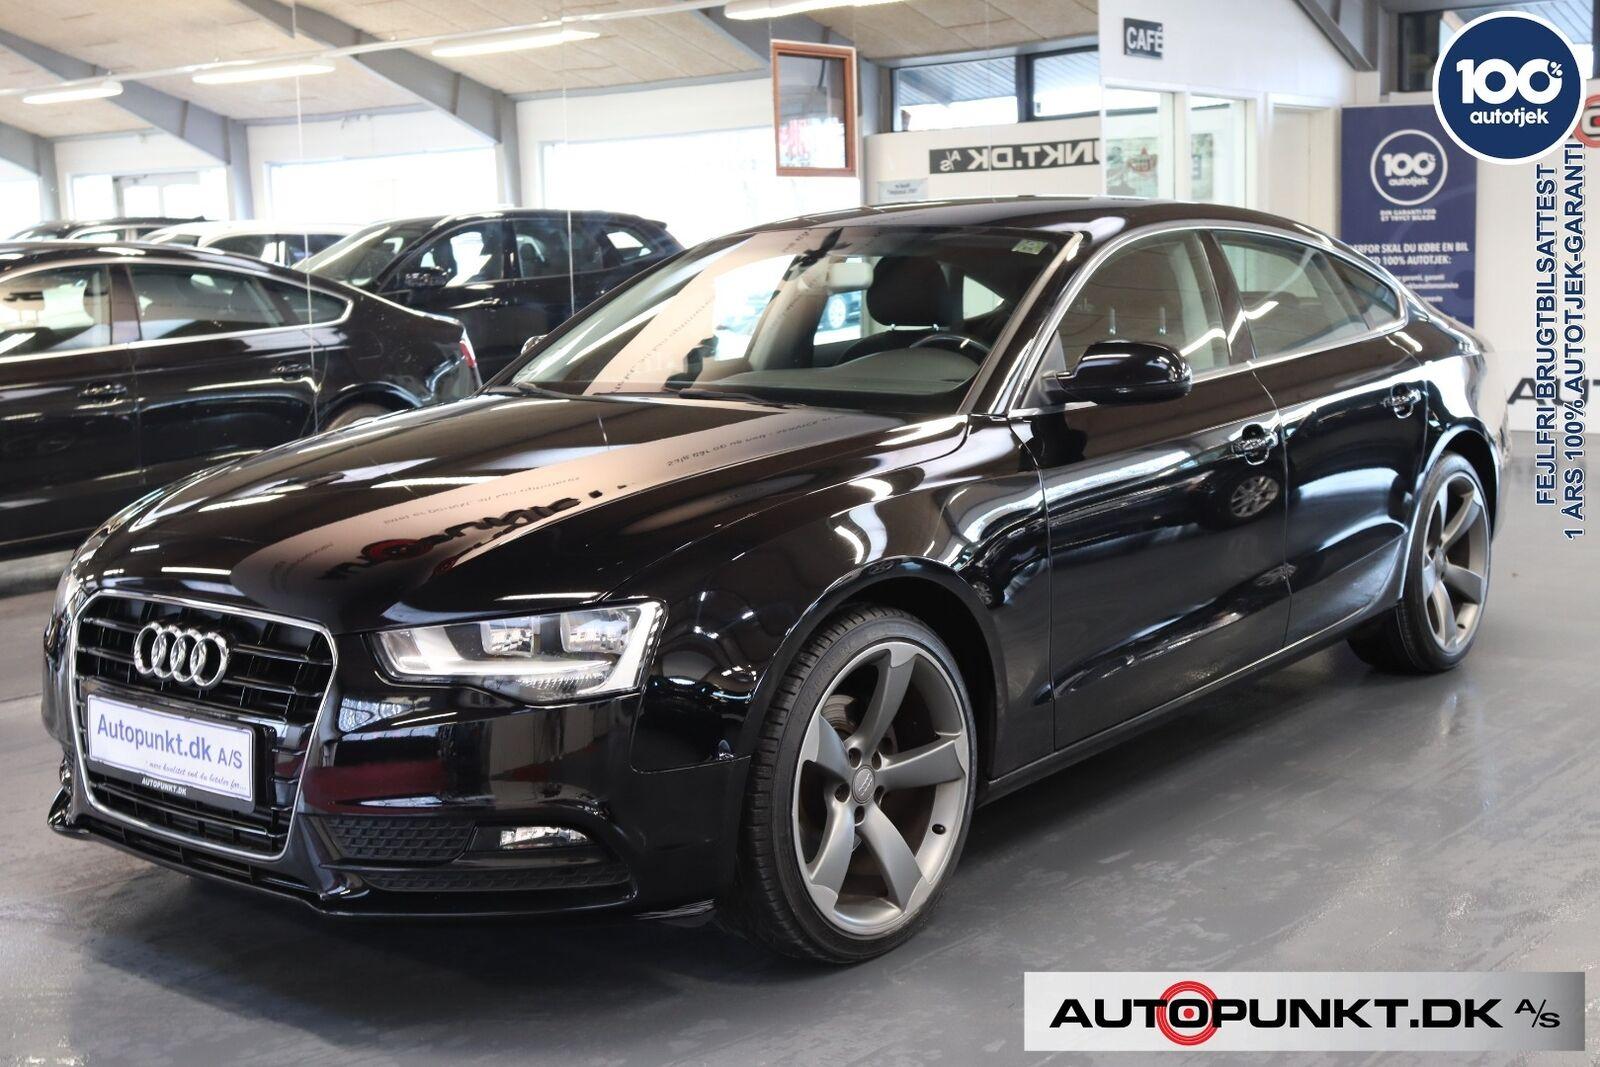 Audi A5 1,8 TFSi 177 Sportback Multitr. 5d - 279.700 kr.